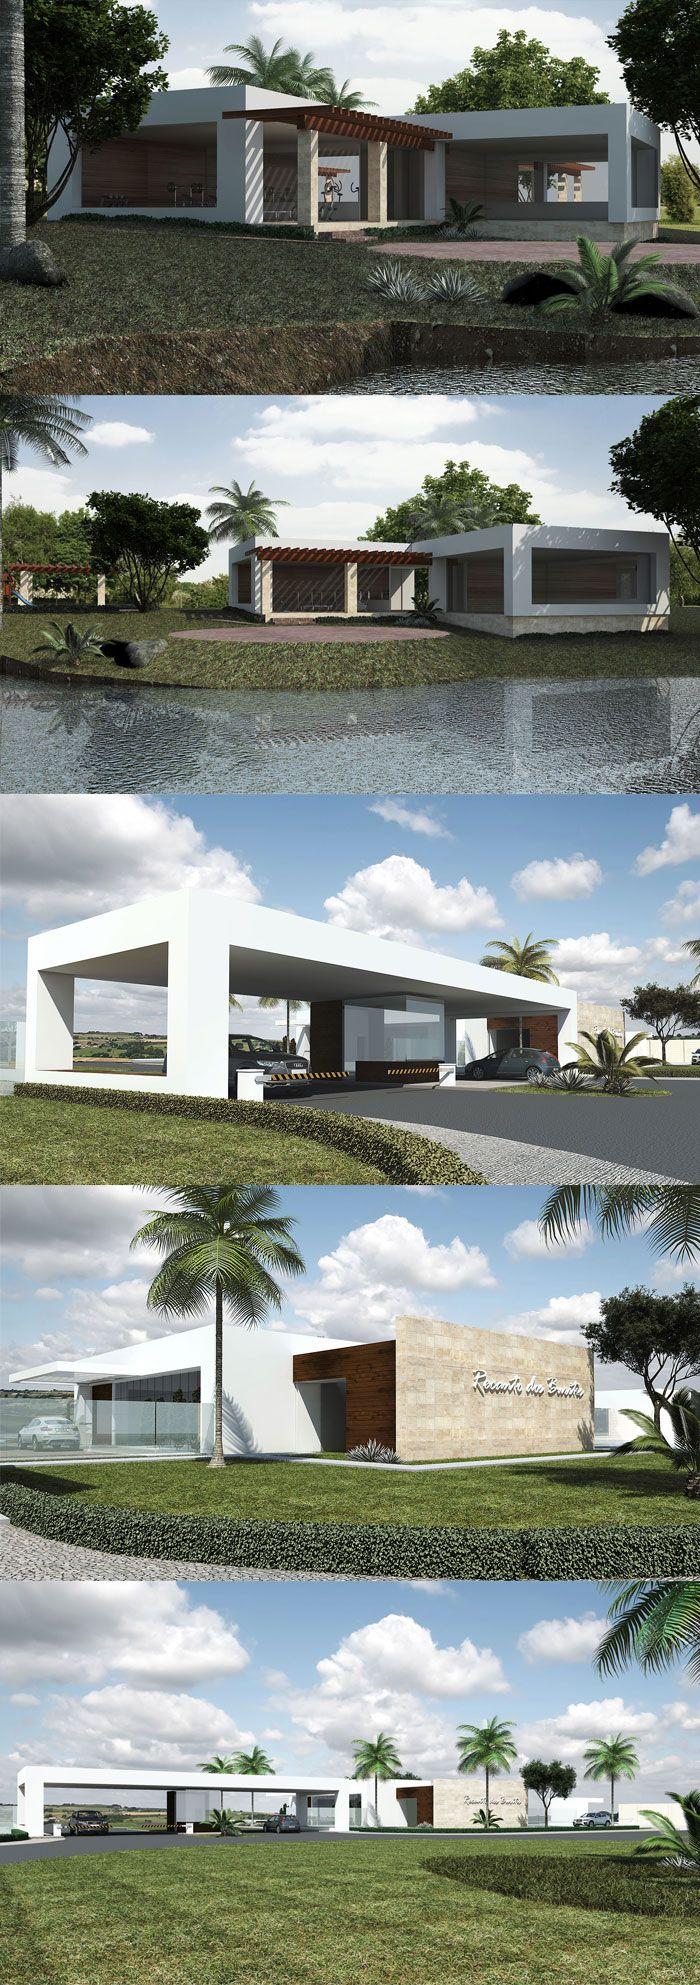 Projeto condominio horizontal.